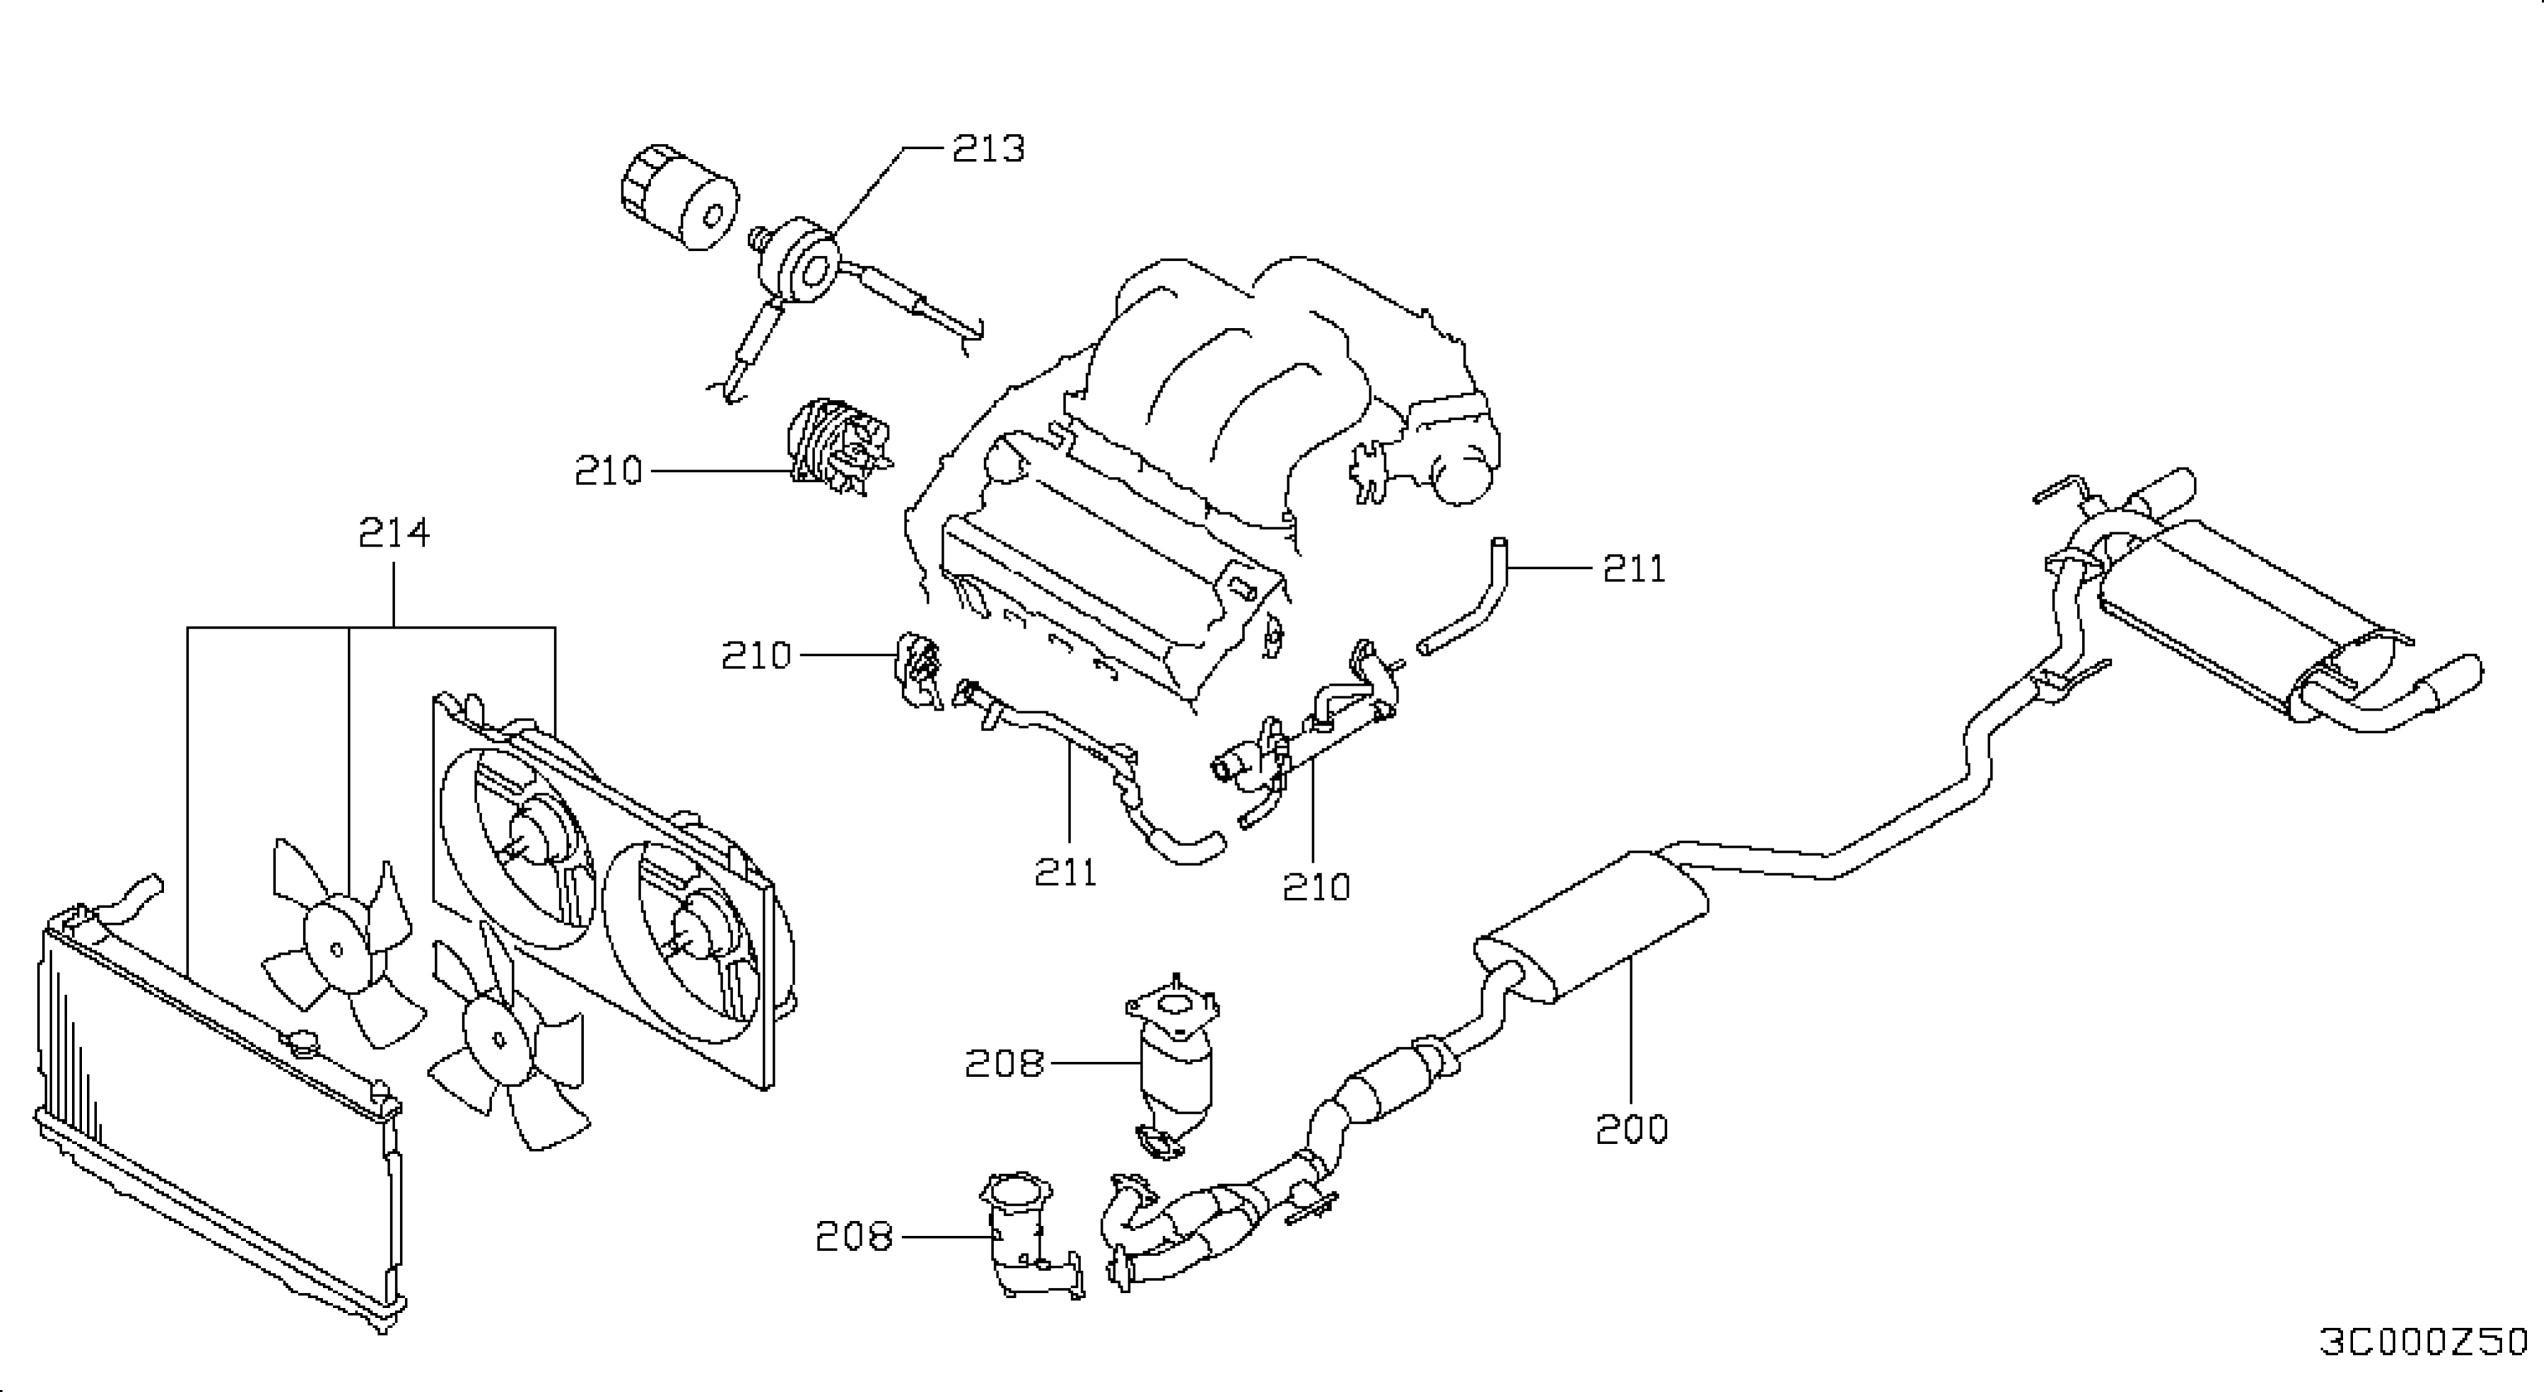 2002 Nissan Altima Engine Diagram Nissan Sentra Engine